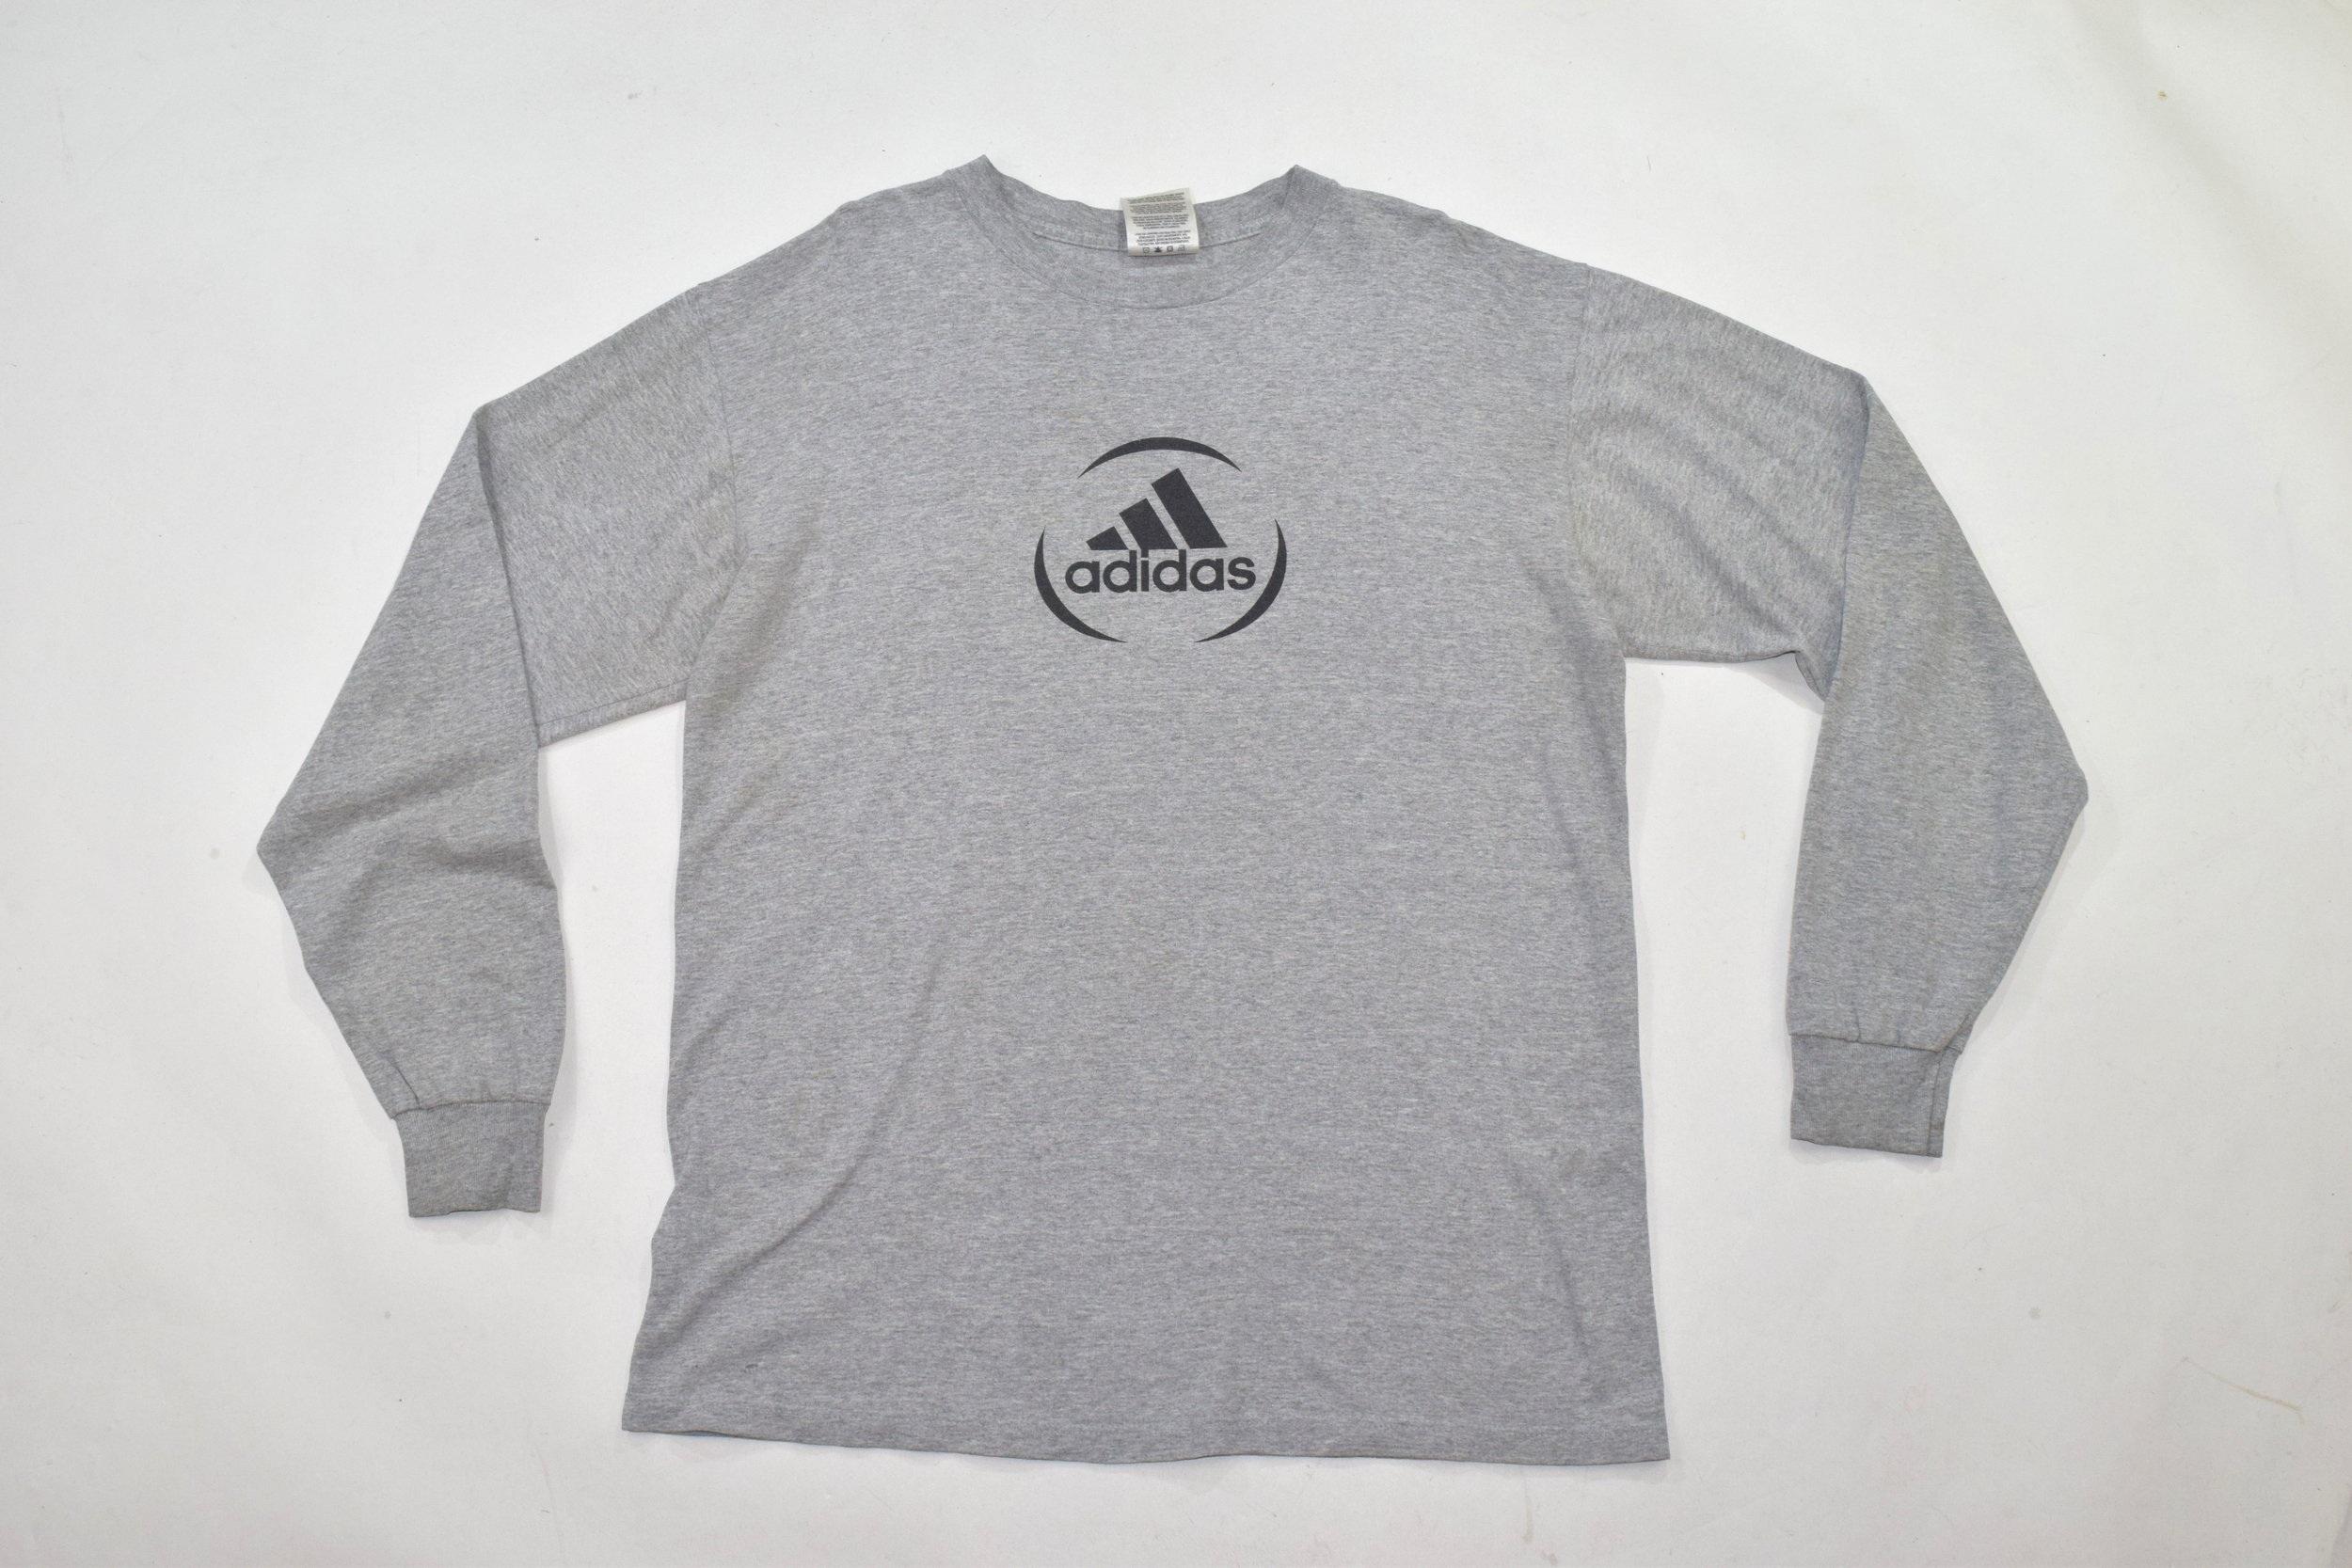 6b989f25 Grey Adidas Crew Neck Long Sleeve T Shirt — Headlock Vintage